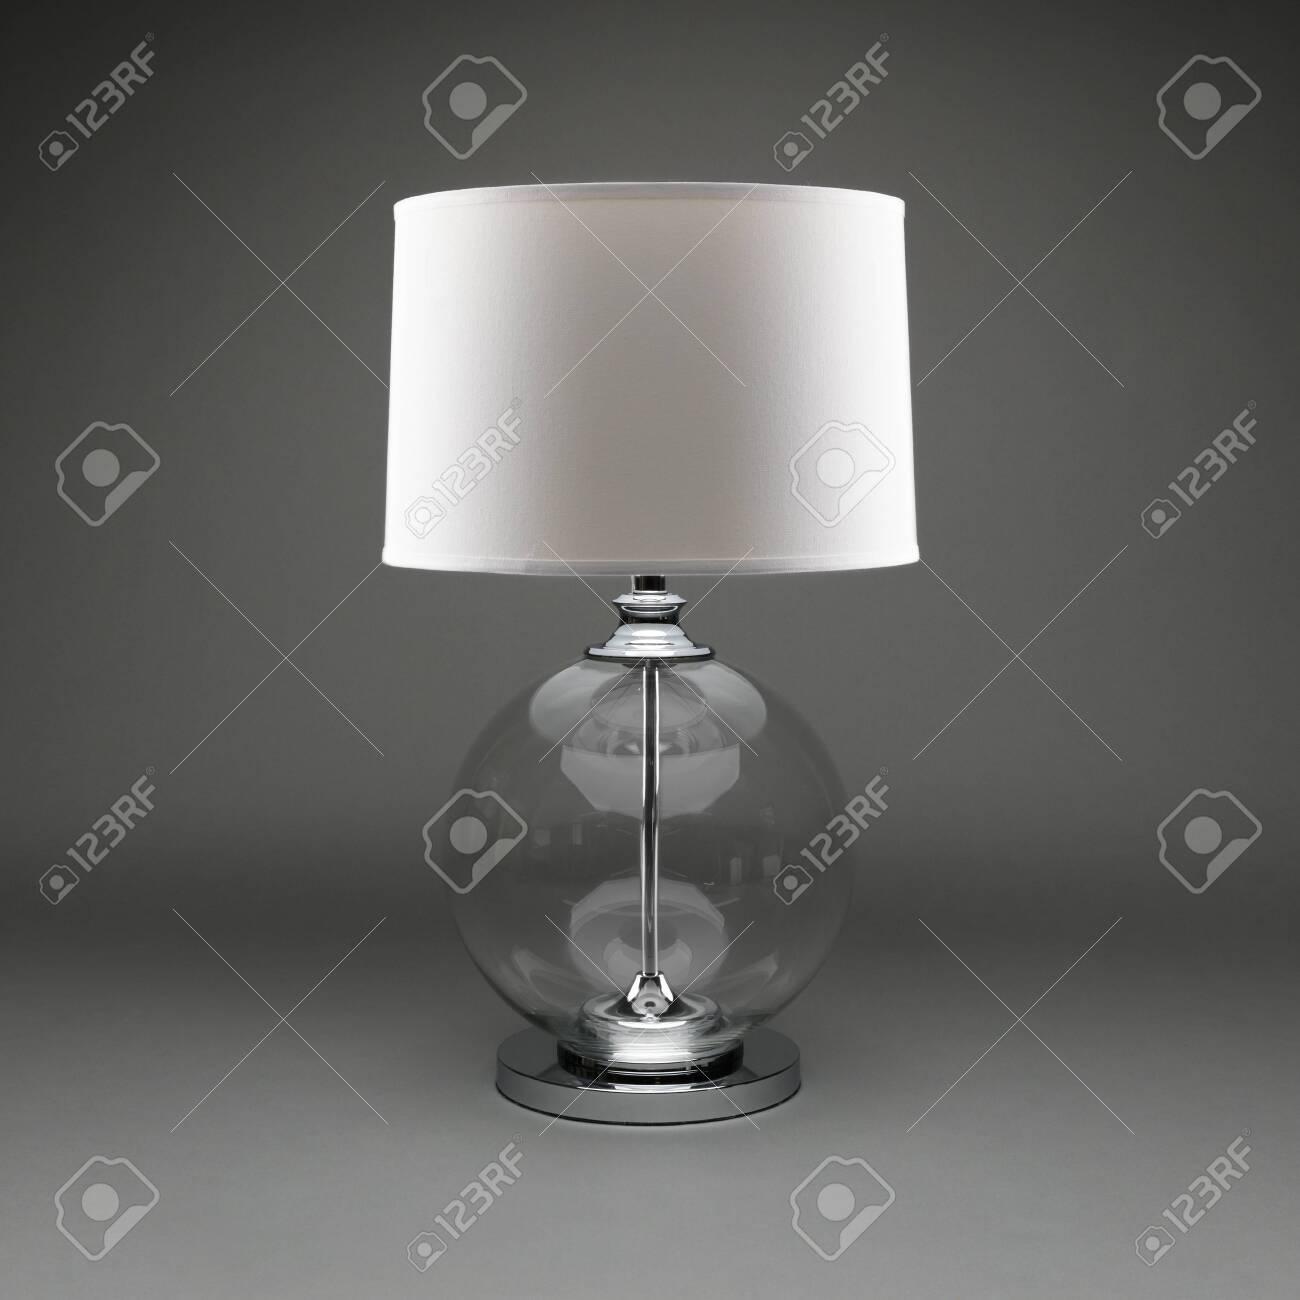 Image of: Individula Clear Glass Ball Table Lamp With White Lamp Shade On A Dark Grey Background Fotos Retratos Imagenes Y Fotografia De Archivo Libres De Derecho Image 129613528